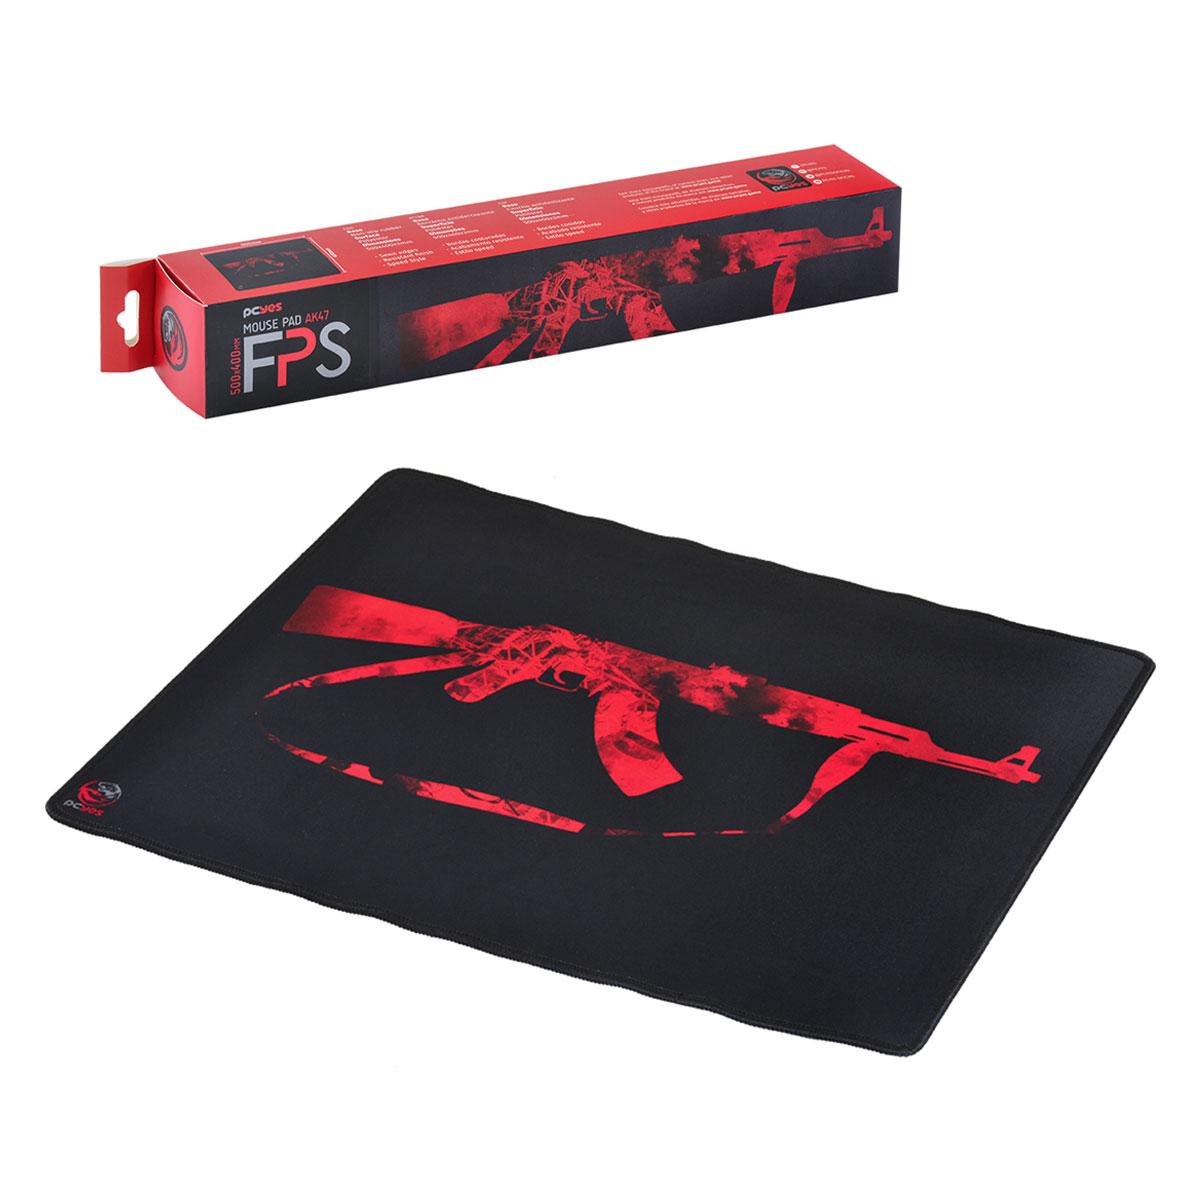 Mouse Pad Gamer PCYes FPS AK47, Antiderrapante, Estilo Speed, 500x400x3mm - 34676